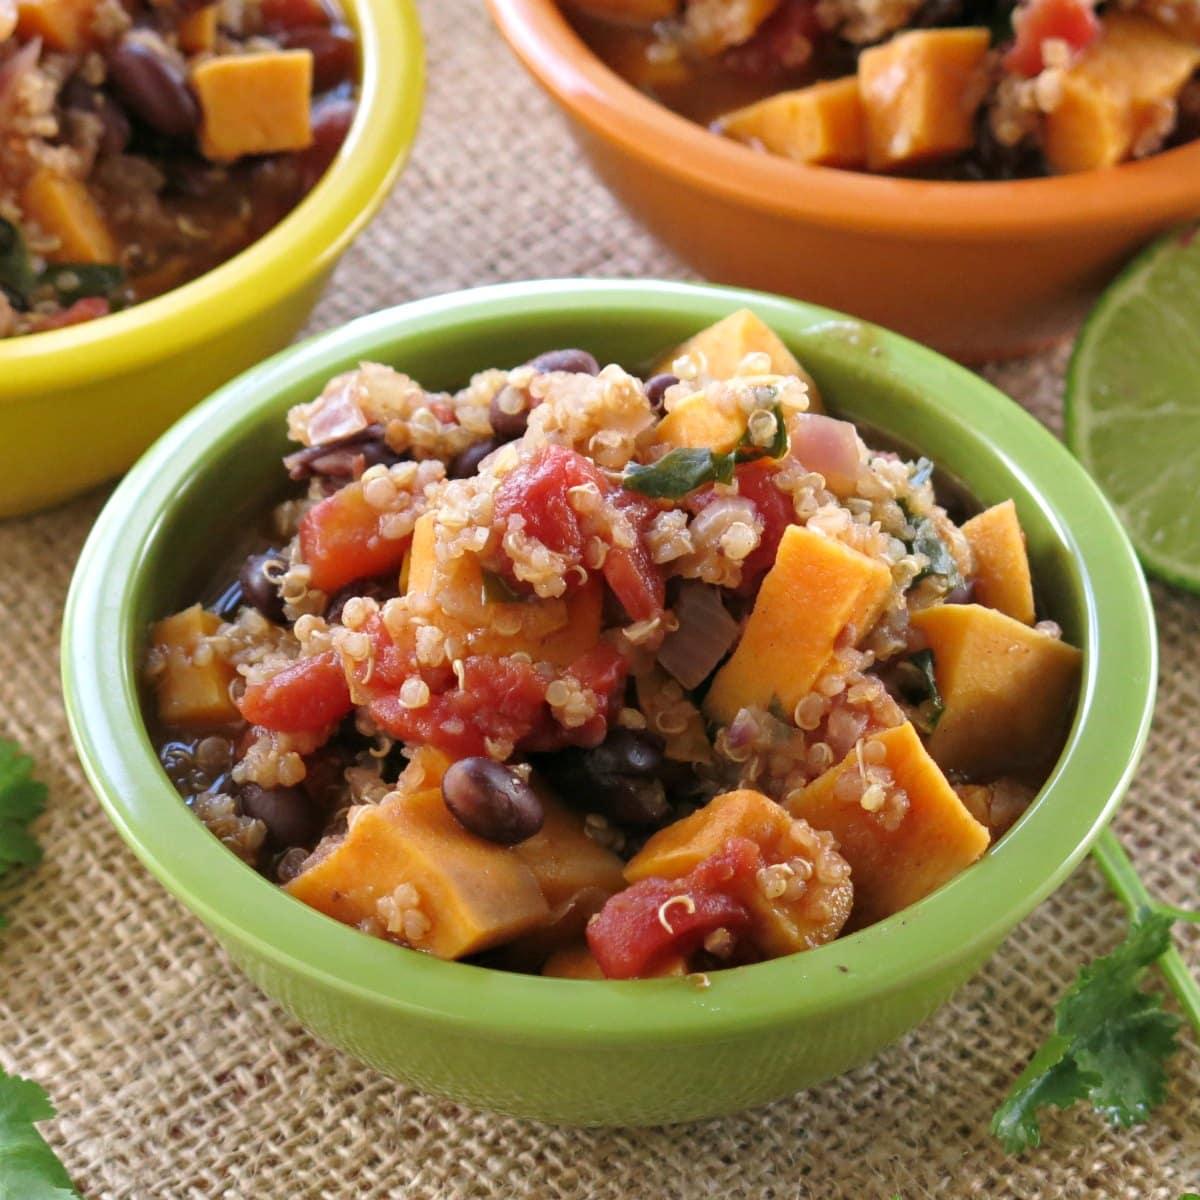 Bowl of Sweet Potato Black Bean Chili with Quinoa